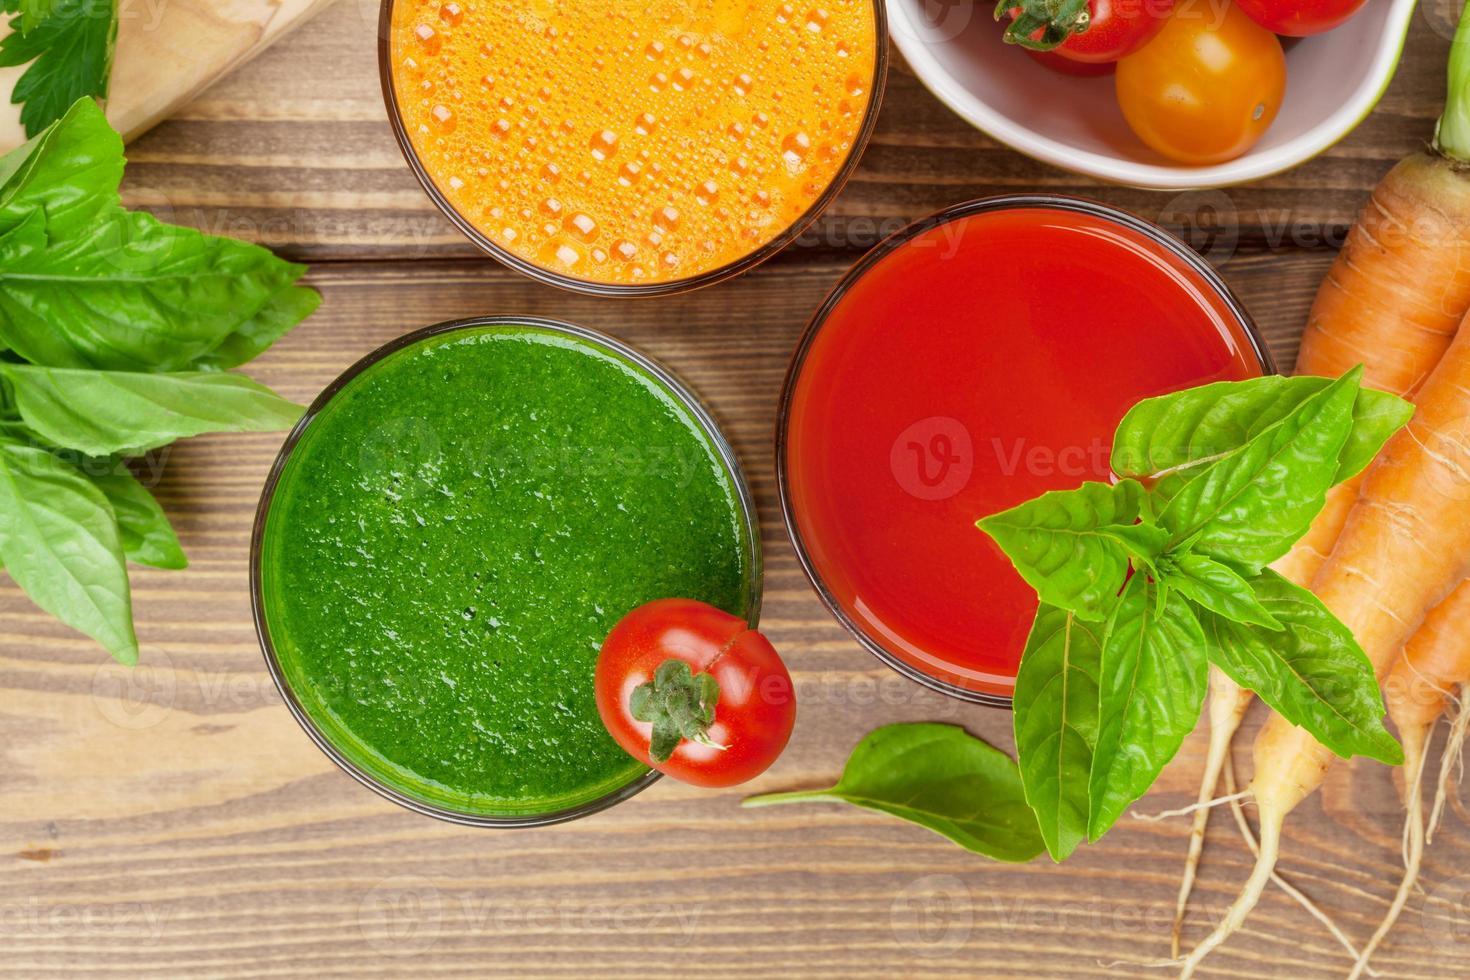 batido de vegetales frescos. tomate, pepino, zanahoria foto